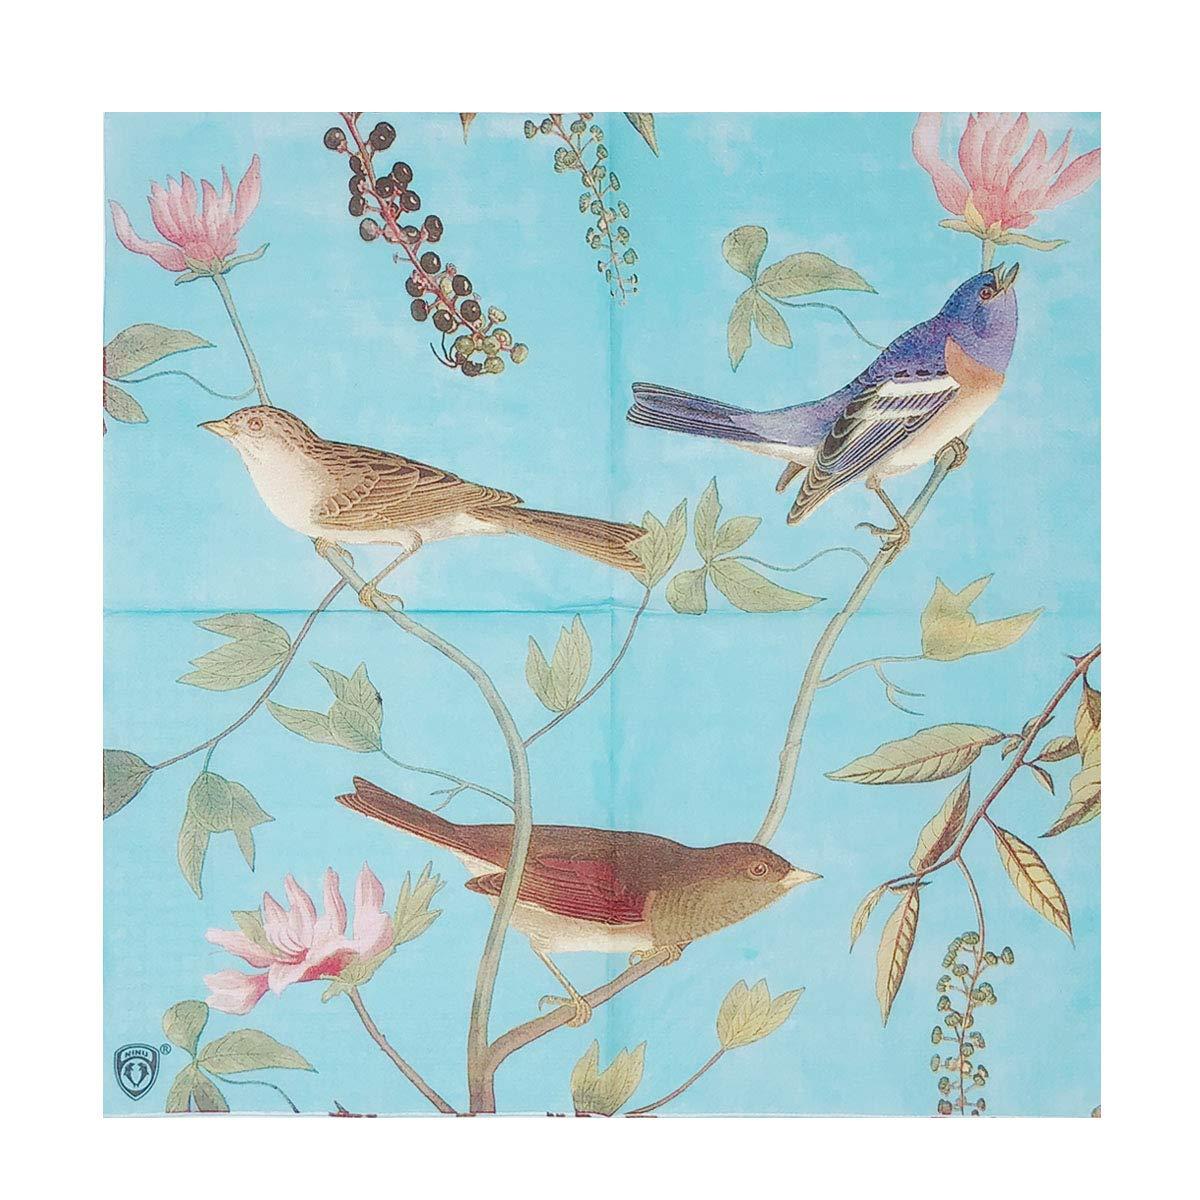 Wrapables フローラル 2層ペーパーナプキン (40枚) 結婚式 ディナーパーティー ティーパーティー 装飾的装飾 One Size B07HC765VL (40 Count), Birds Blue